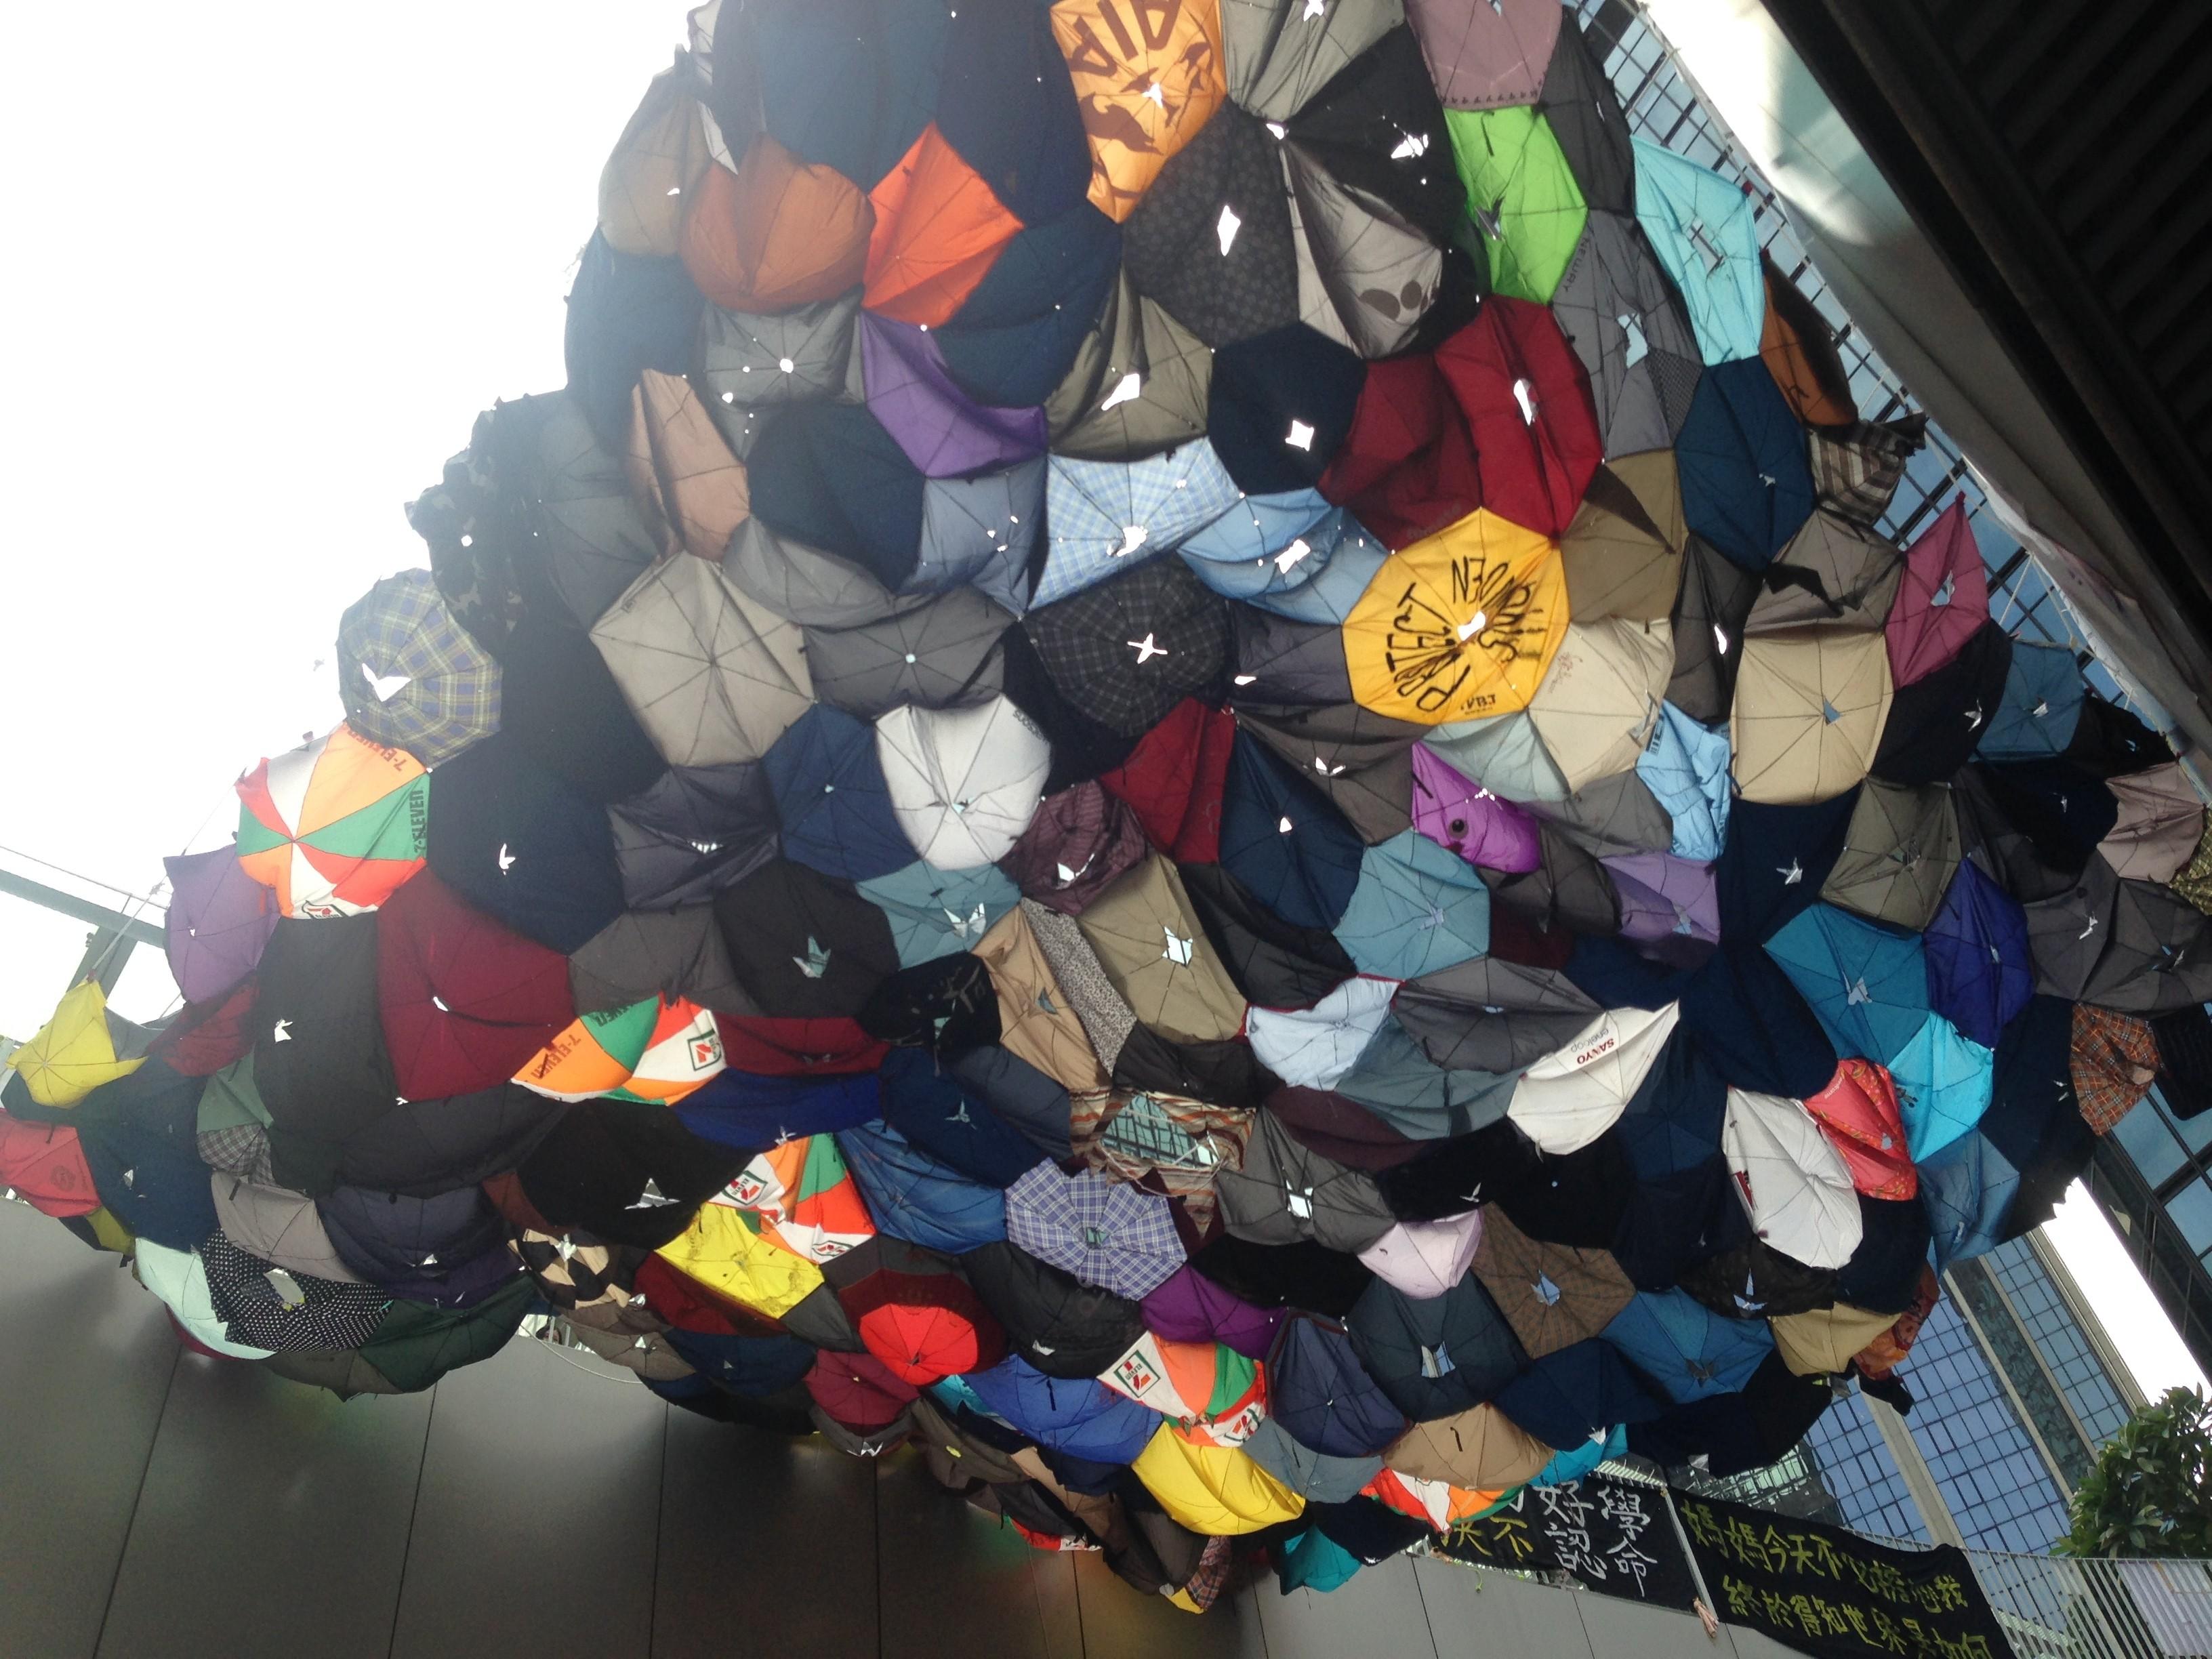 telhado guarda-chuva 2